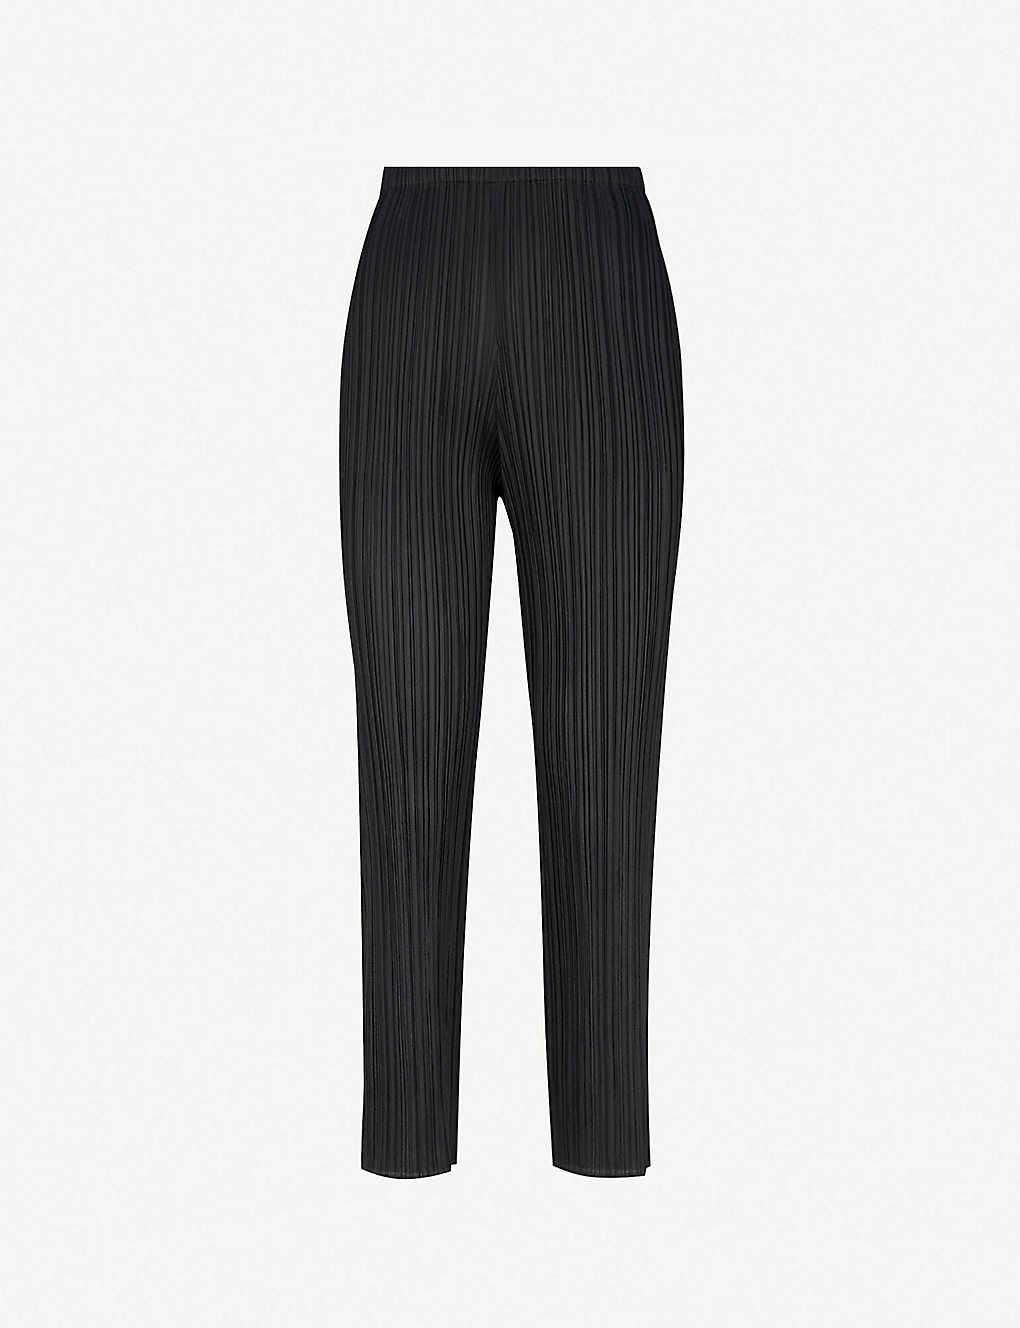 10dc75f371 PLEATS PLEASE ISSEY MIYAKE - Cropped slim pleated trousers | Selfridges.com